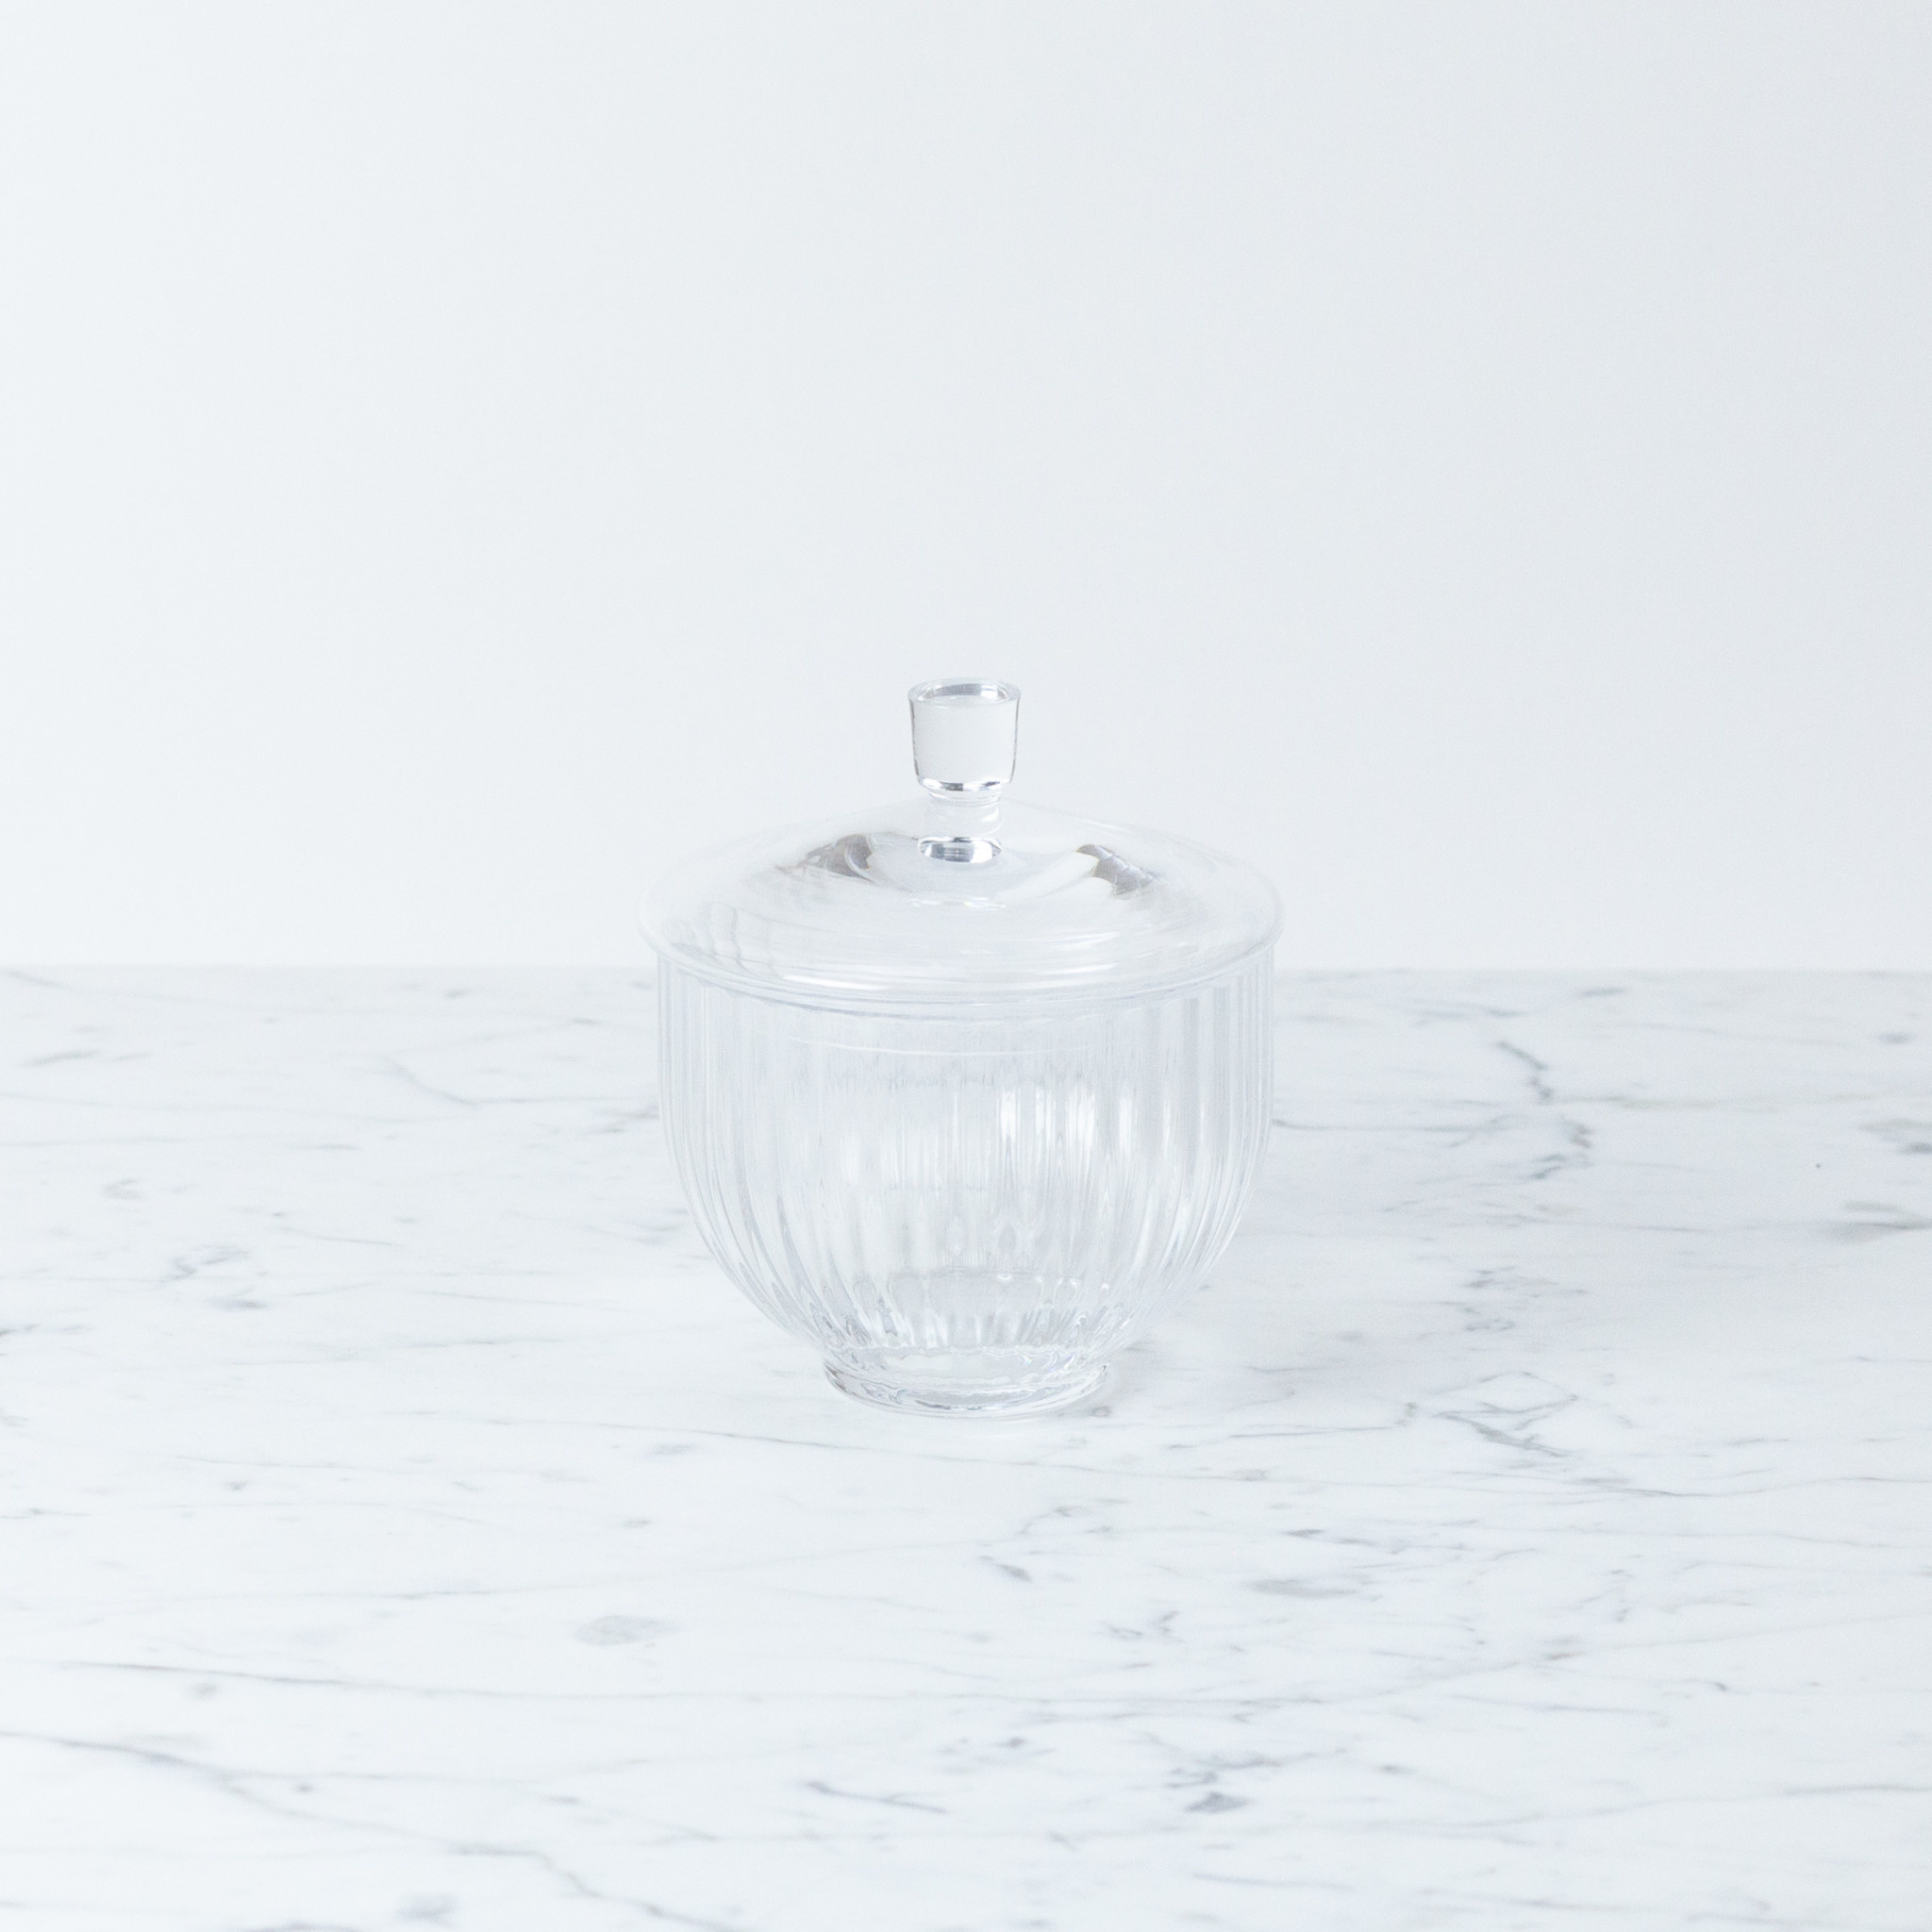 Lyngby Porcelain Lyngby Bonbonniere - 10 cm - Clear Glass